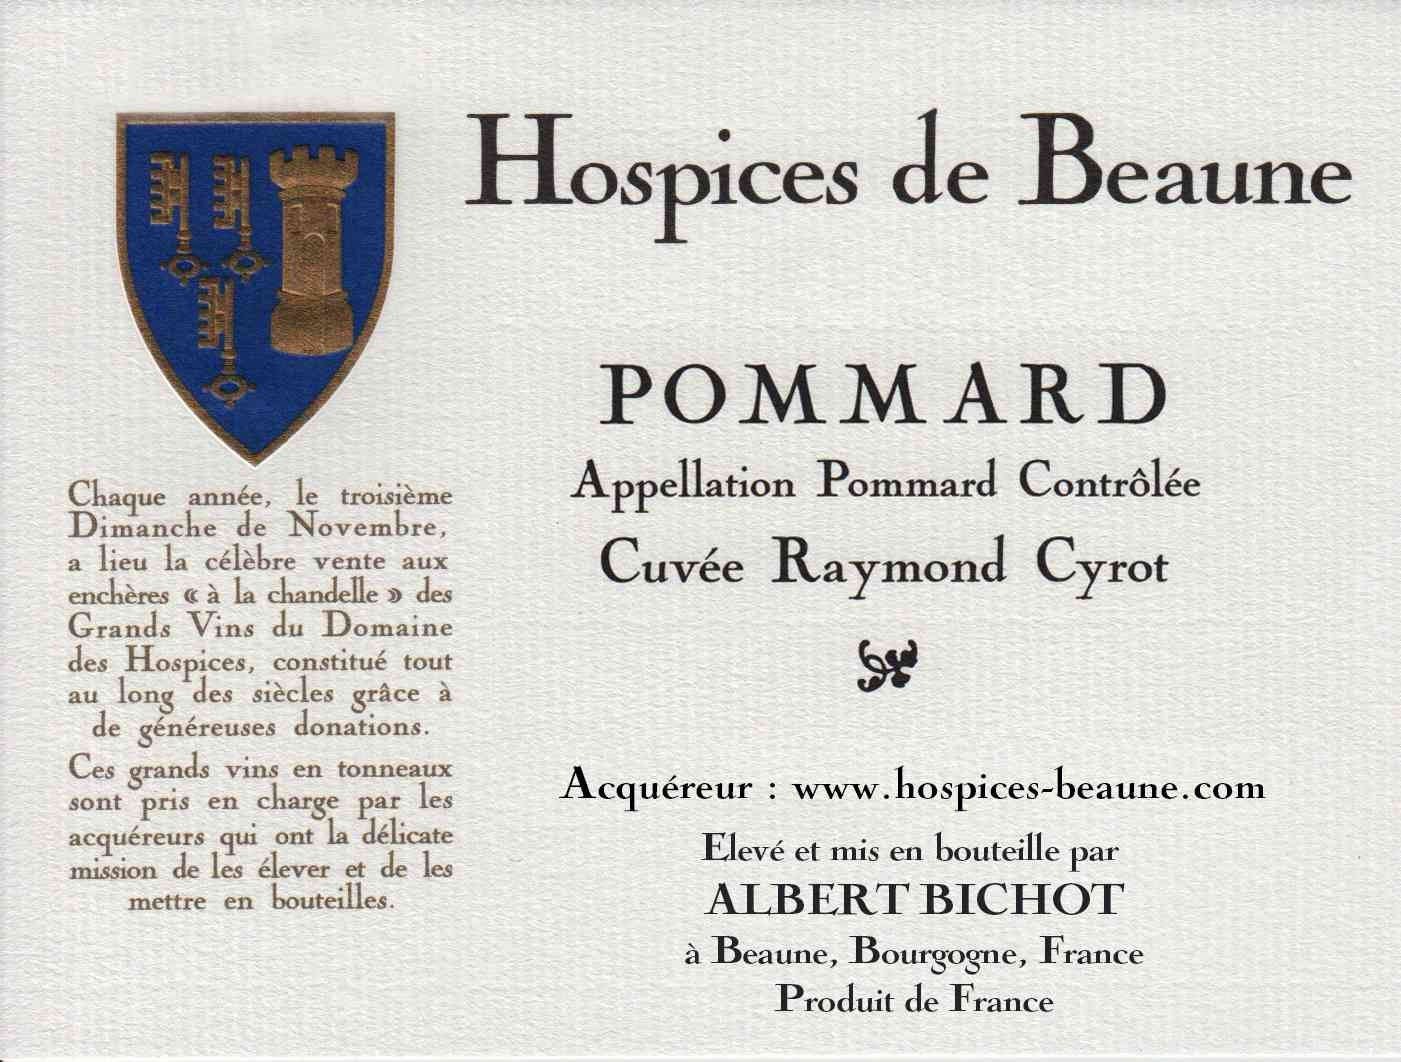 Encheres-auction-HospicesdeBeaune-AlbertBichot-Pommard-Cuvee-RaymondCyrot